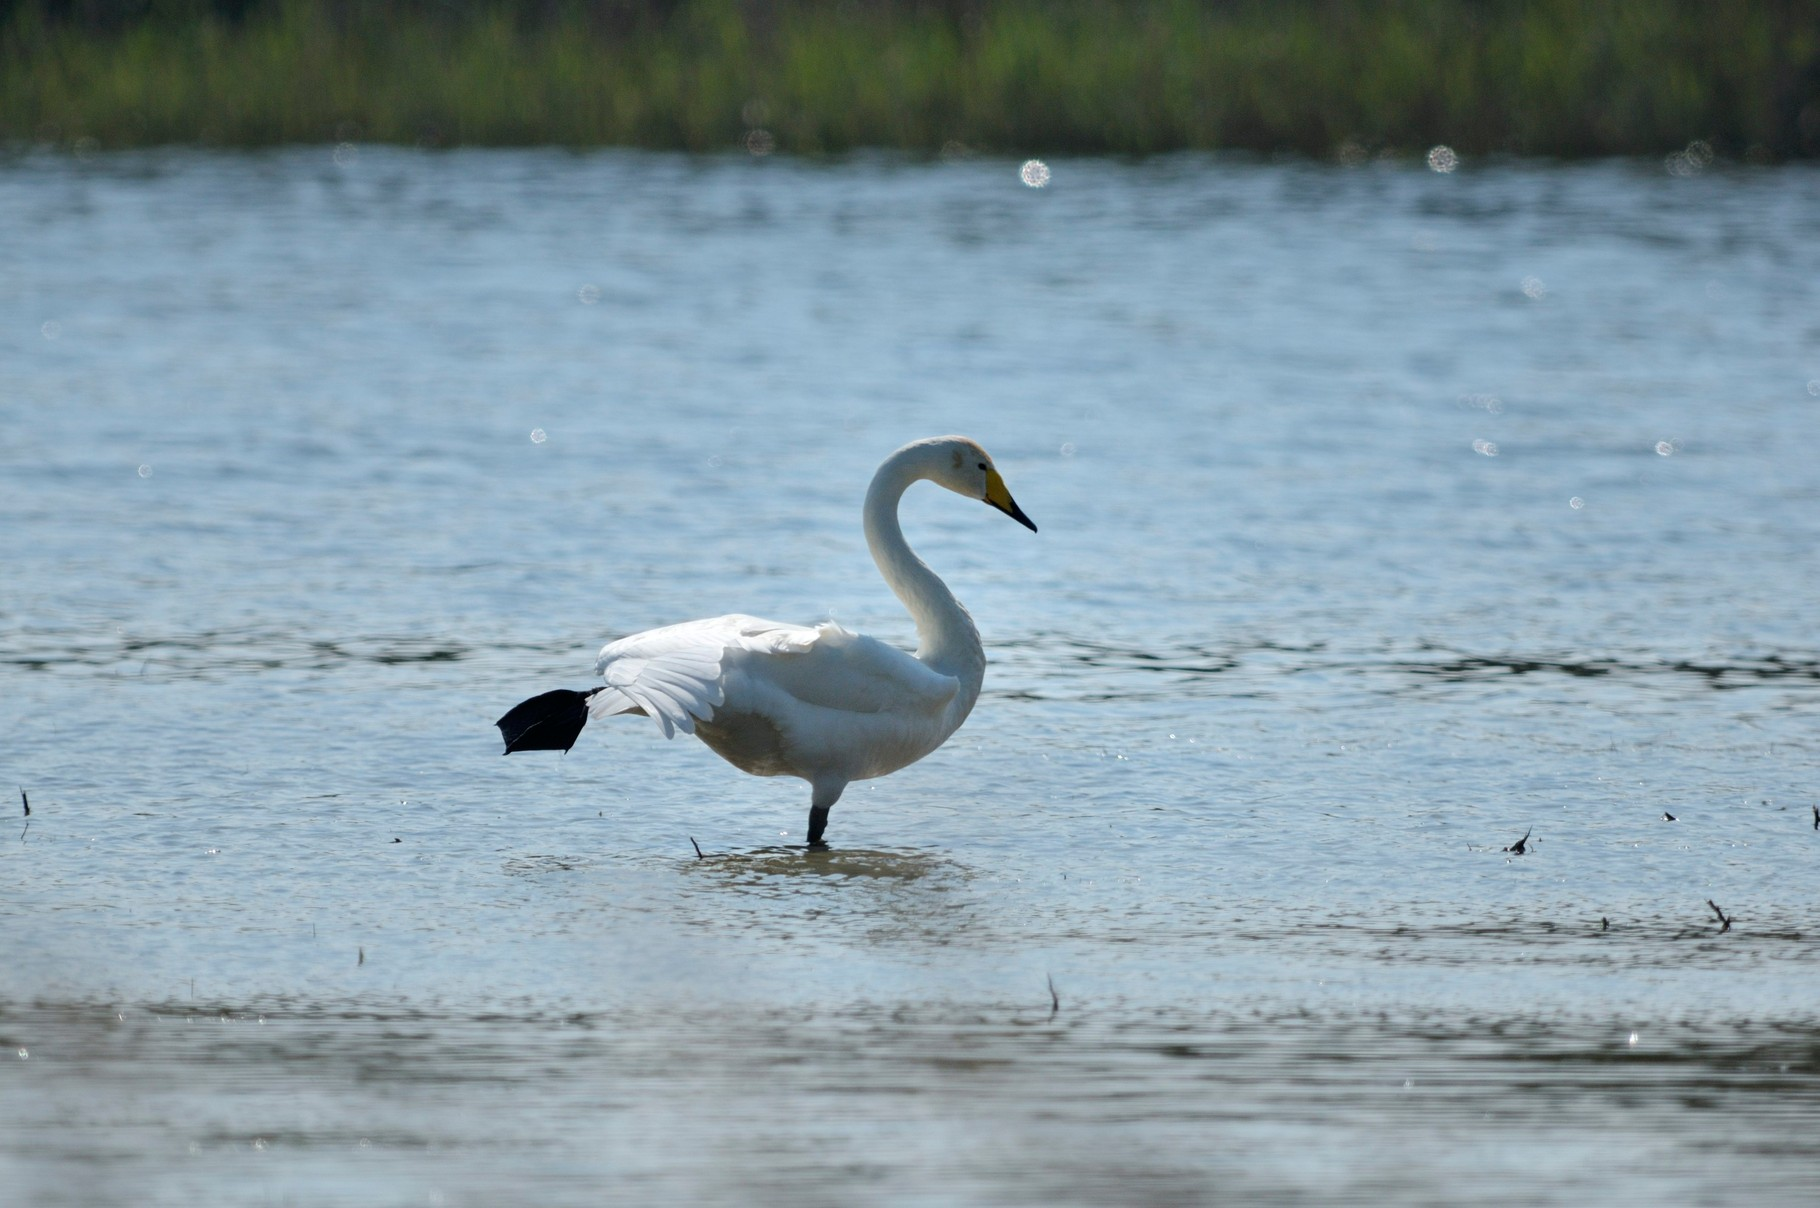 Cygne chanteur-Cygnus cygnus - Whooper Swan_DSC1141